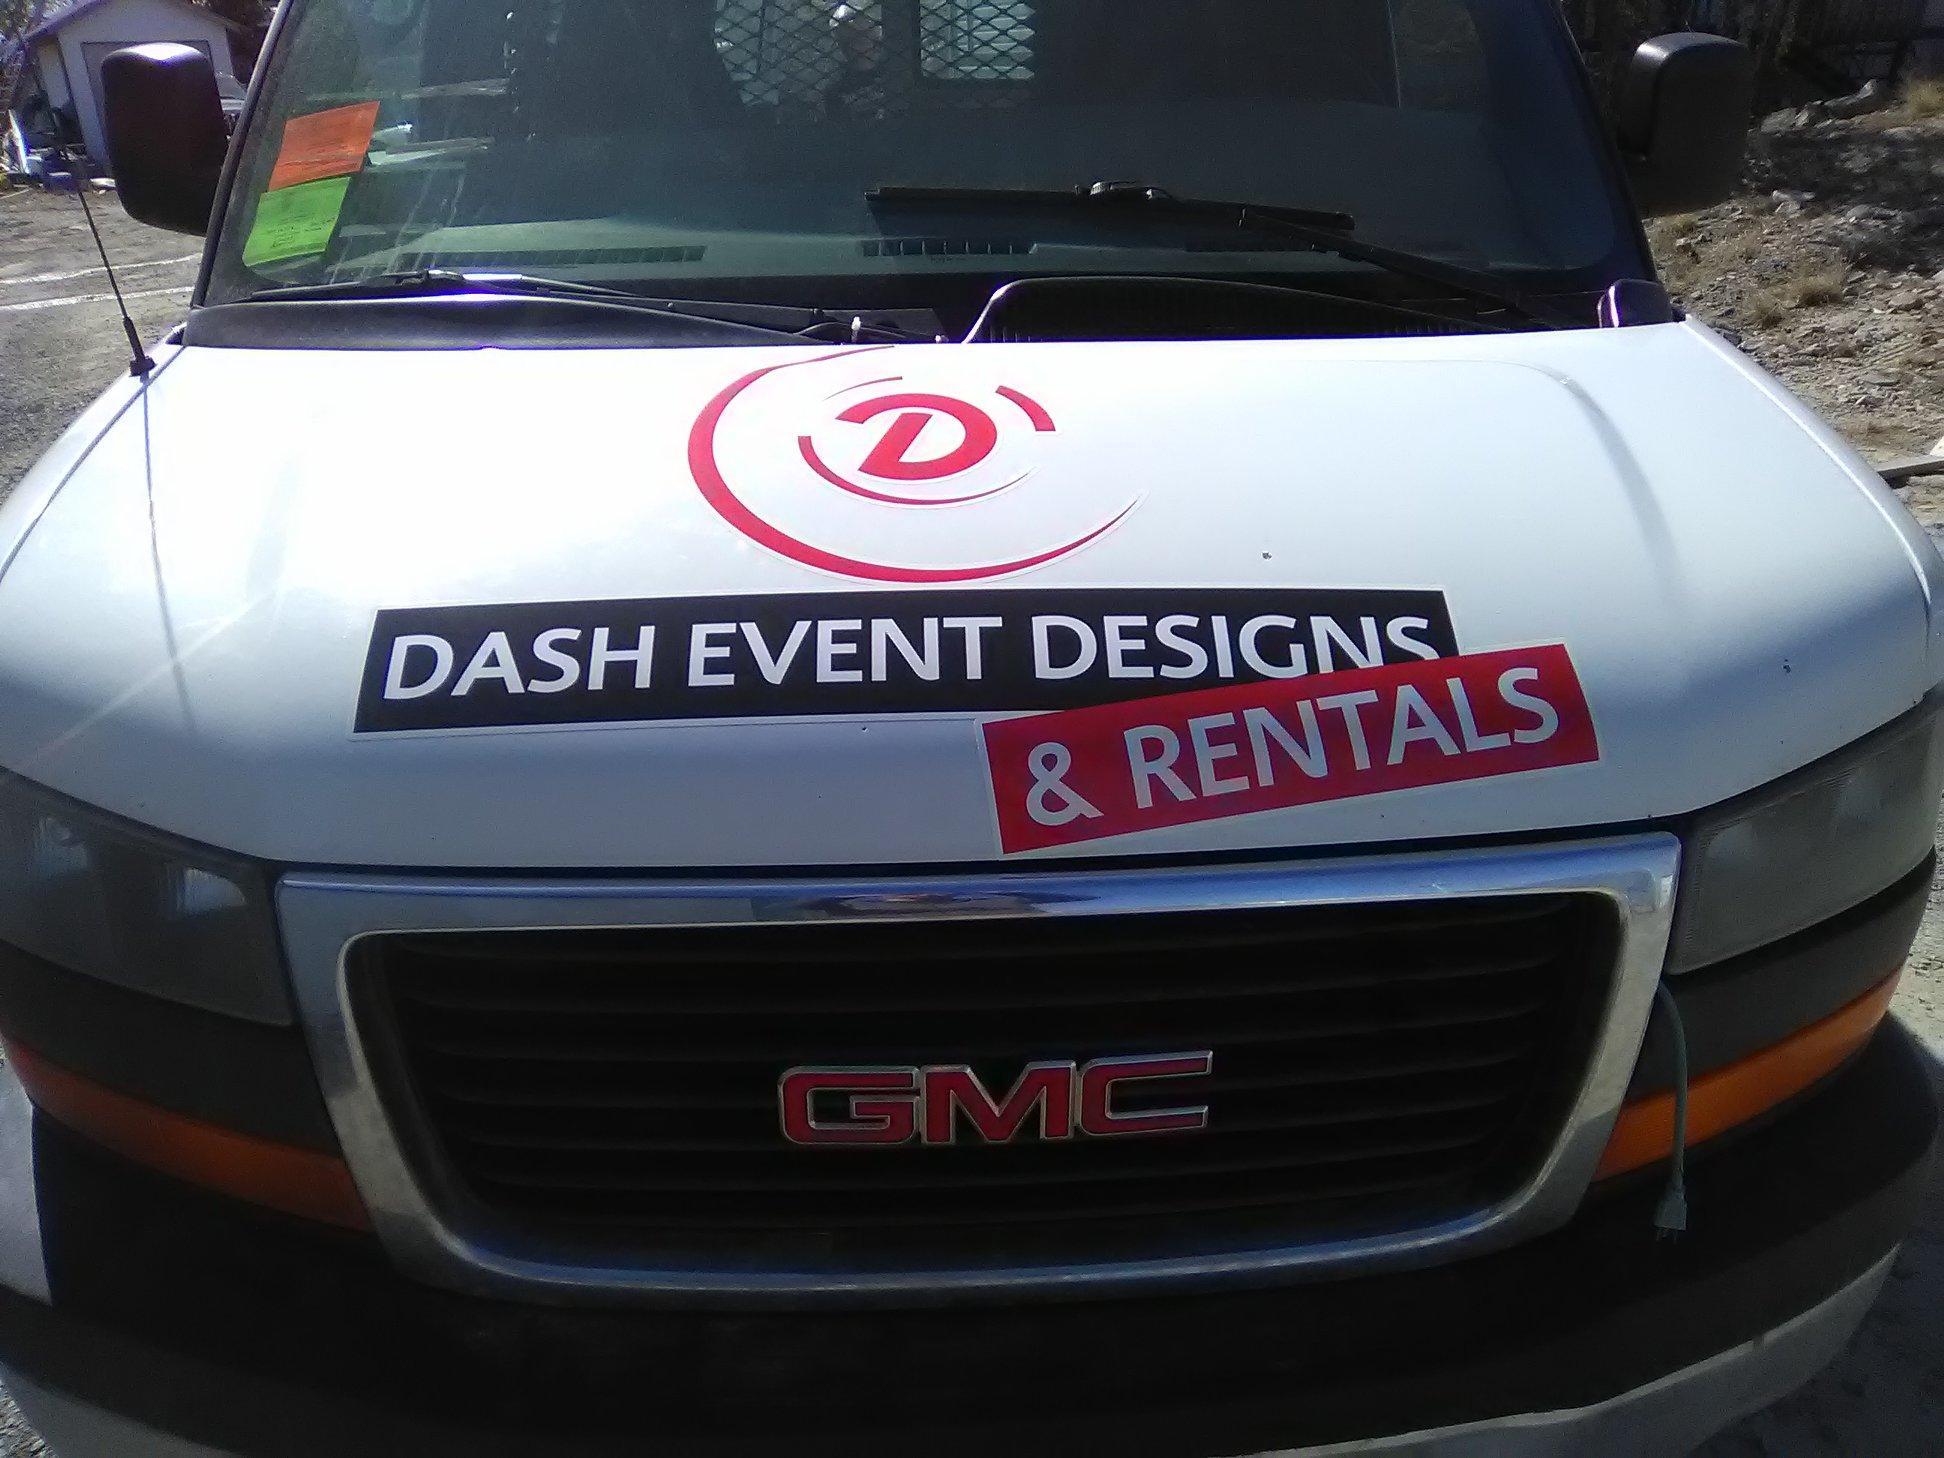 Dash Event Designs & Rentals commercial vehicle wrap